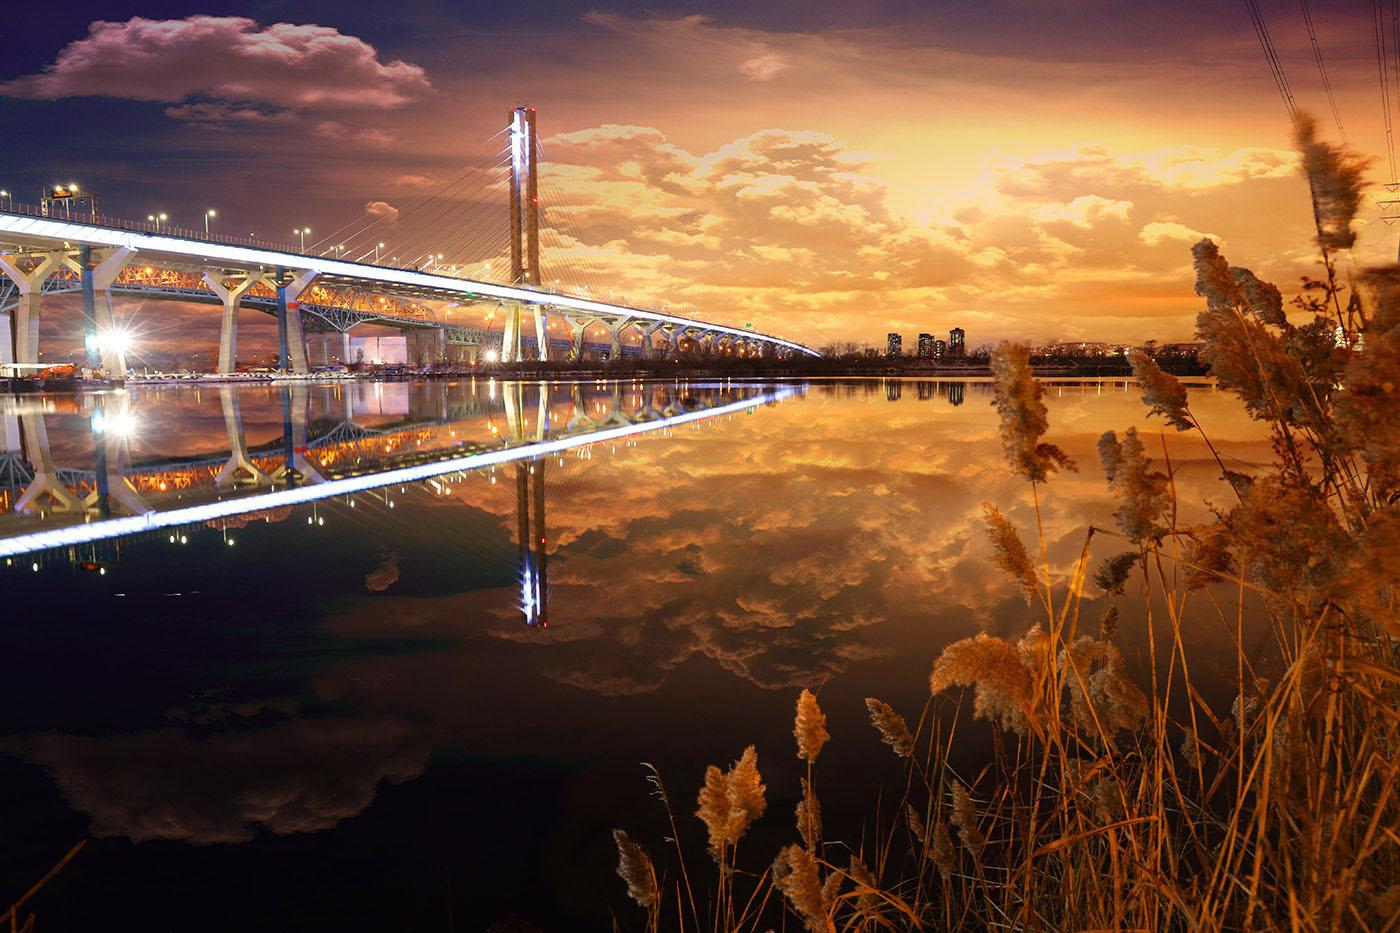 New Champlain Bridge in Montreal City at Night - Stock Photo